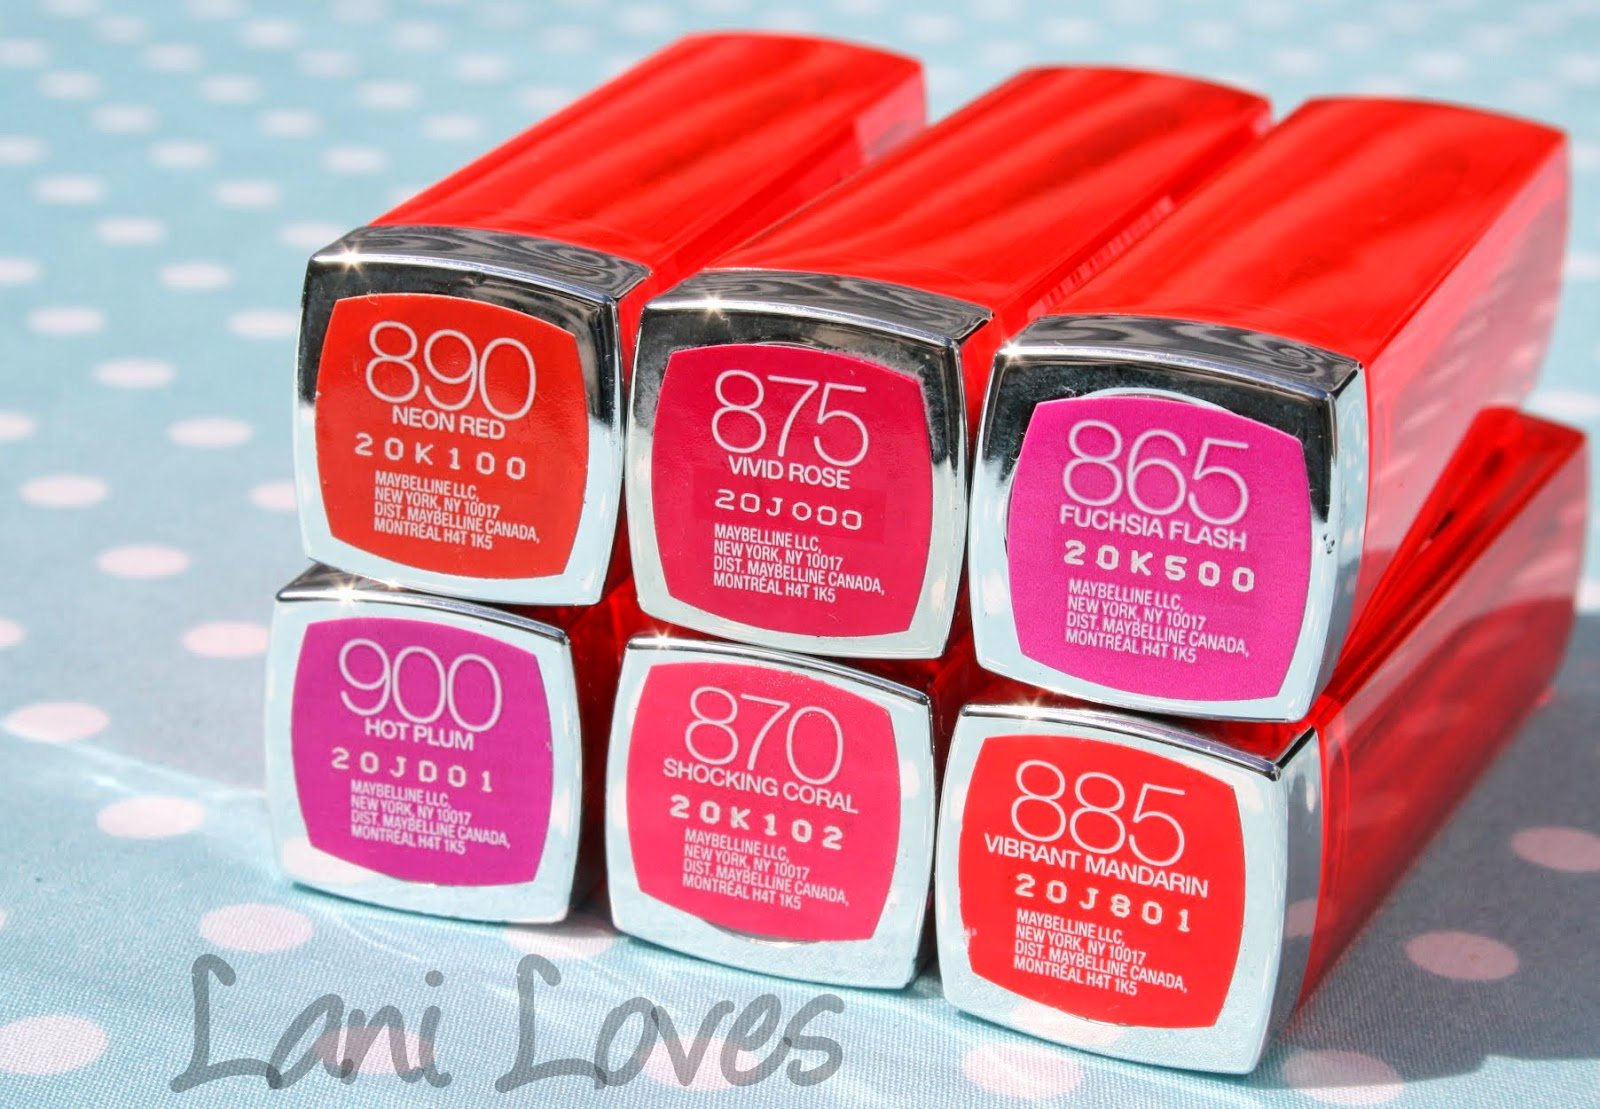 Maybelline Colorsensational Vivids - Neon Red, Vivid Rose, Fuchsia Flash, Hot Plum, Shocking Coral & Vibrant Mandarin